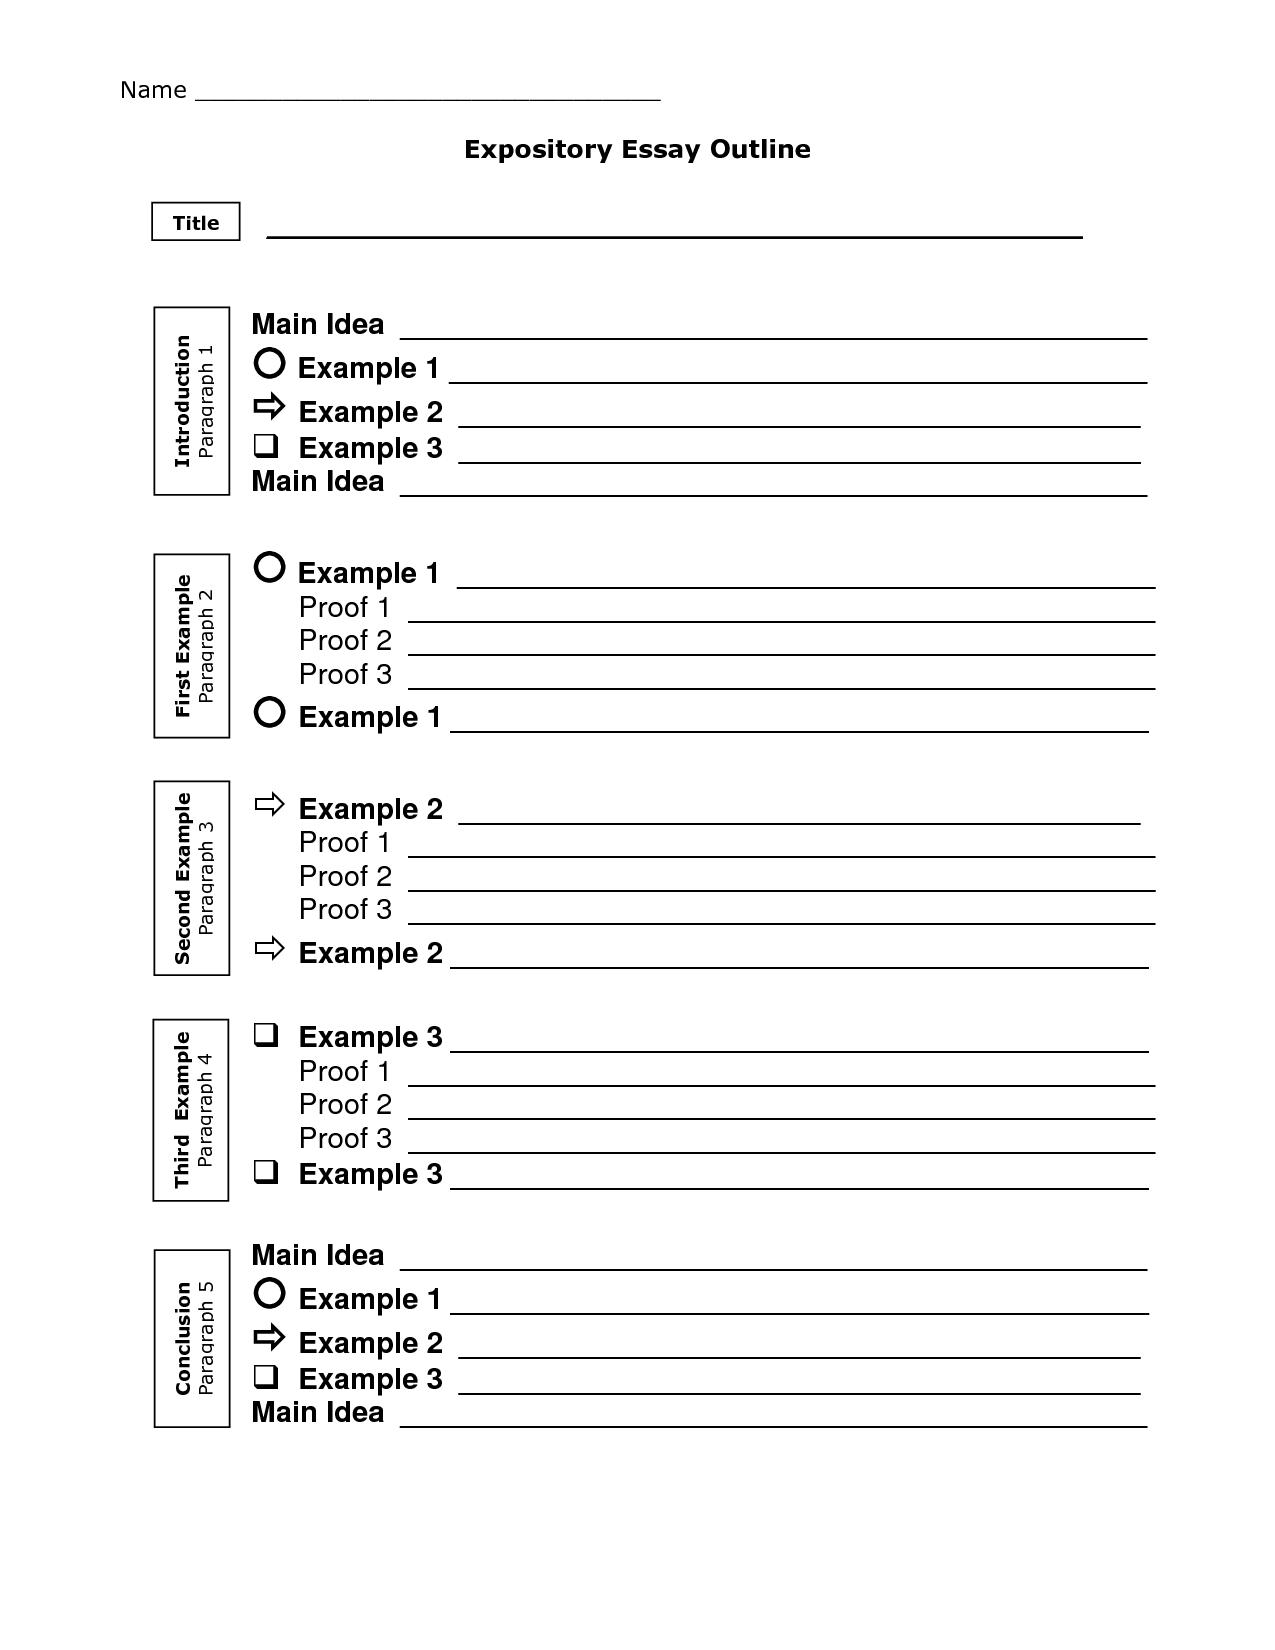 18 Best Images Of Expository Essay Outline Worksheet